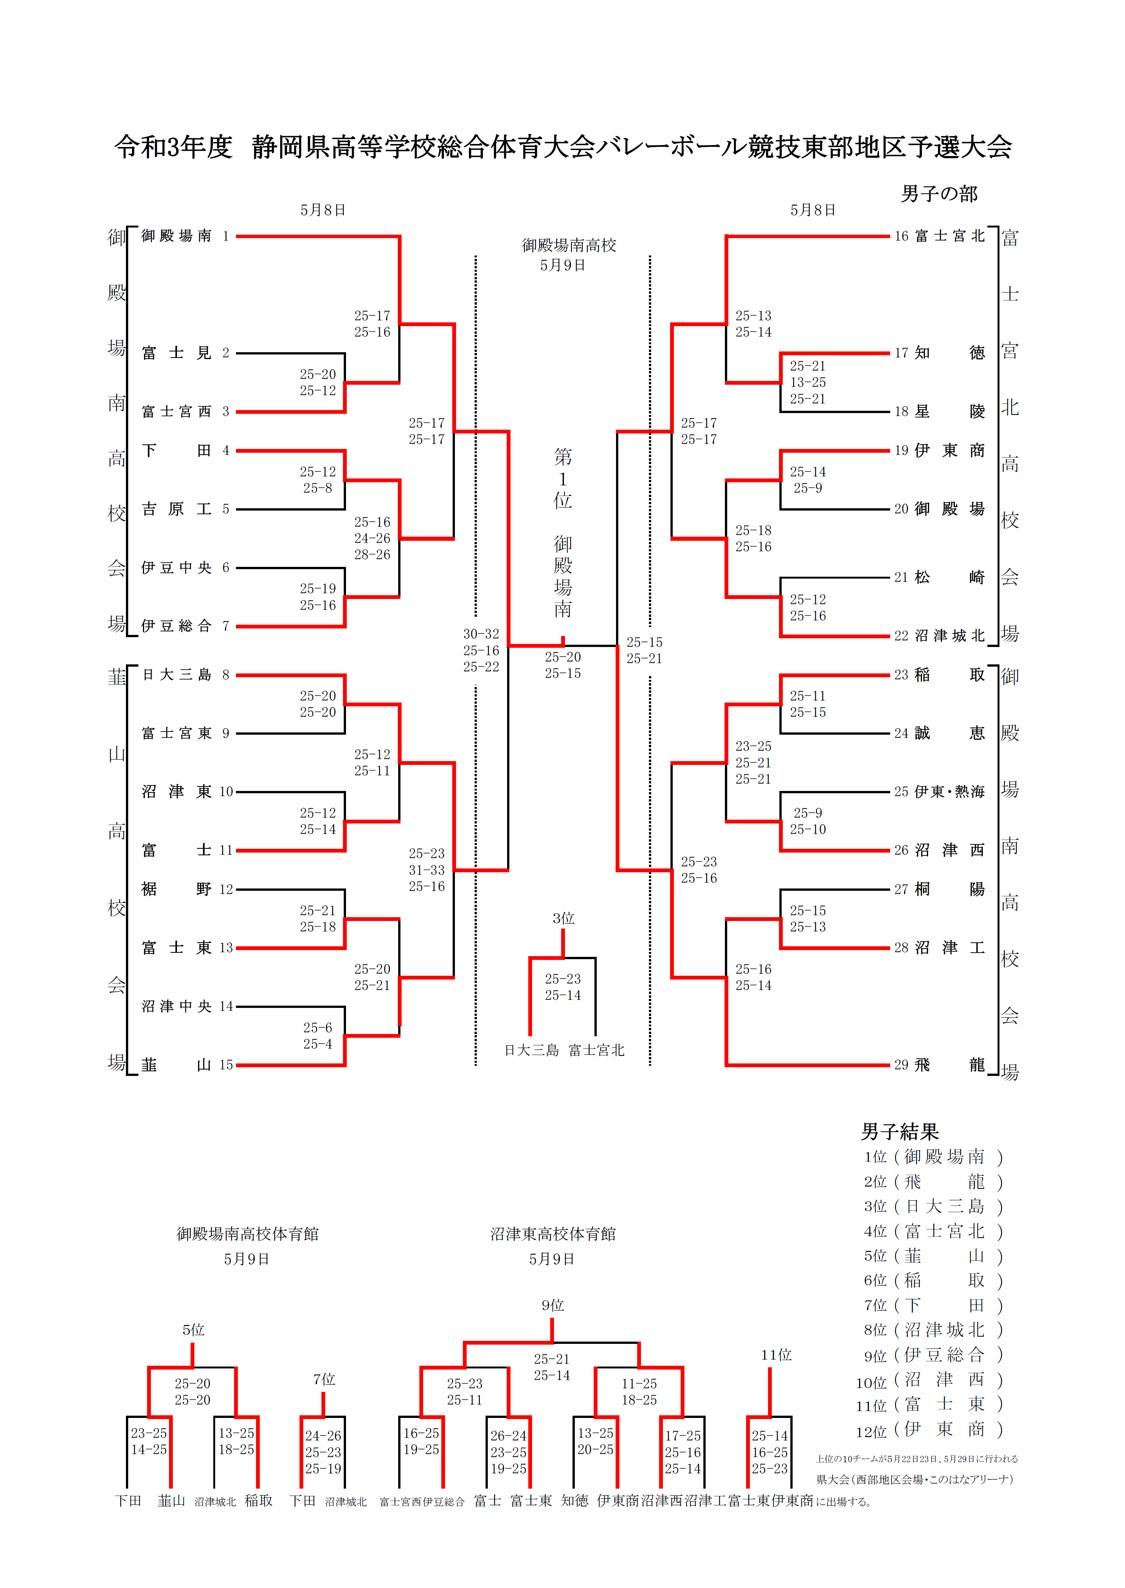 2021年度_インターハイ予選_静岡県_東部地区_男子_結果